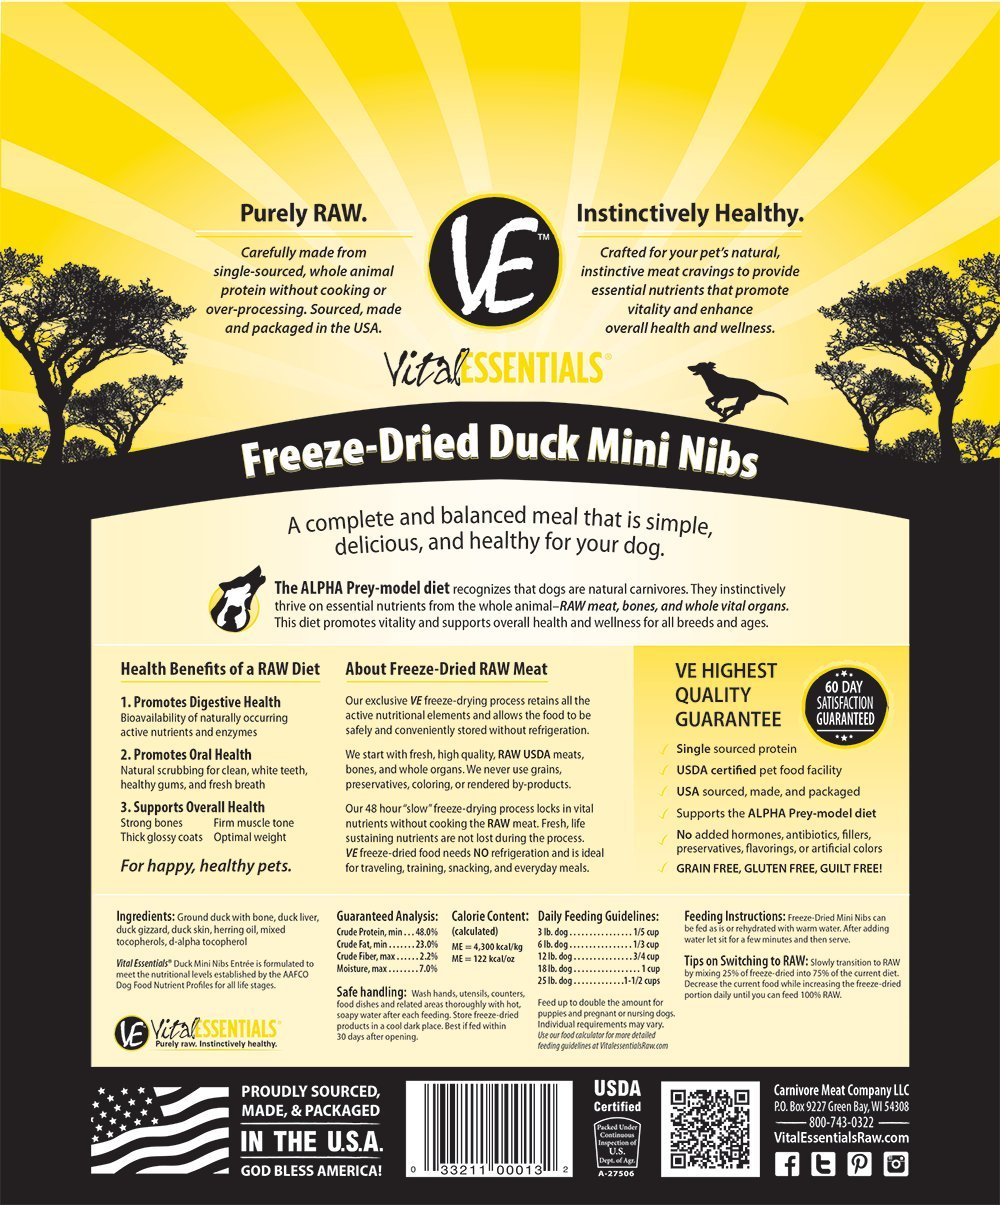 Vital Essentials Freeze-Dried Duck Mini Nibs Grain Free Limited Ingredient Dog Entrée, 1 Pound Bag by Vital Essentials (Image #2)